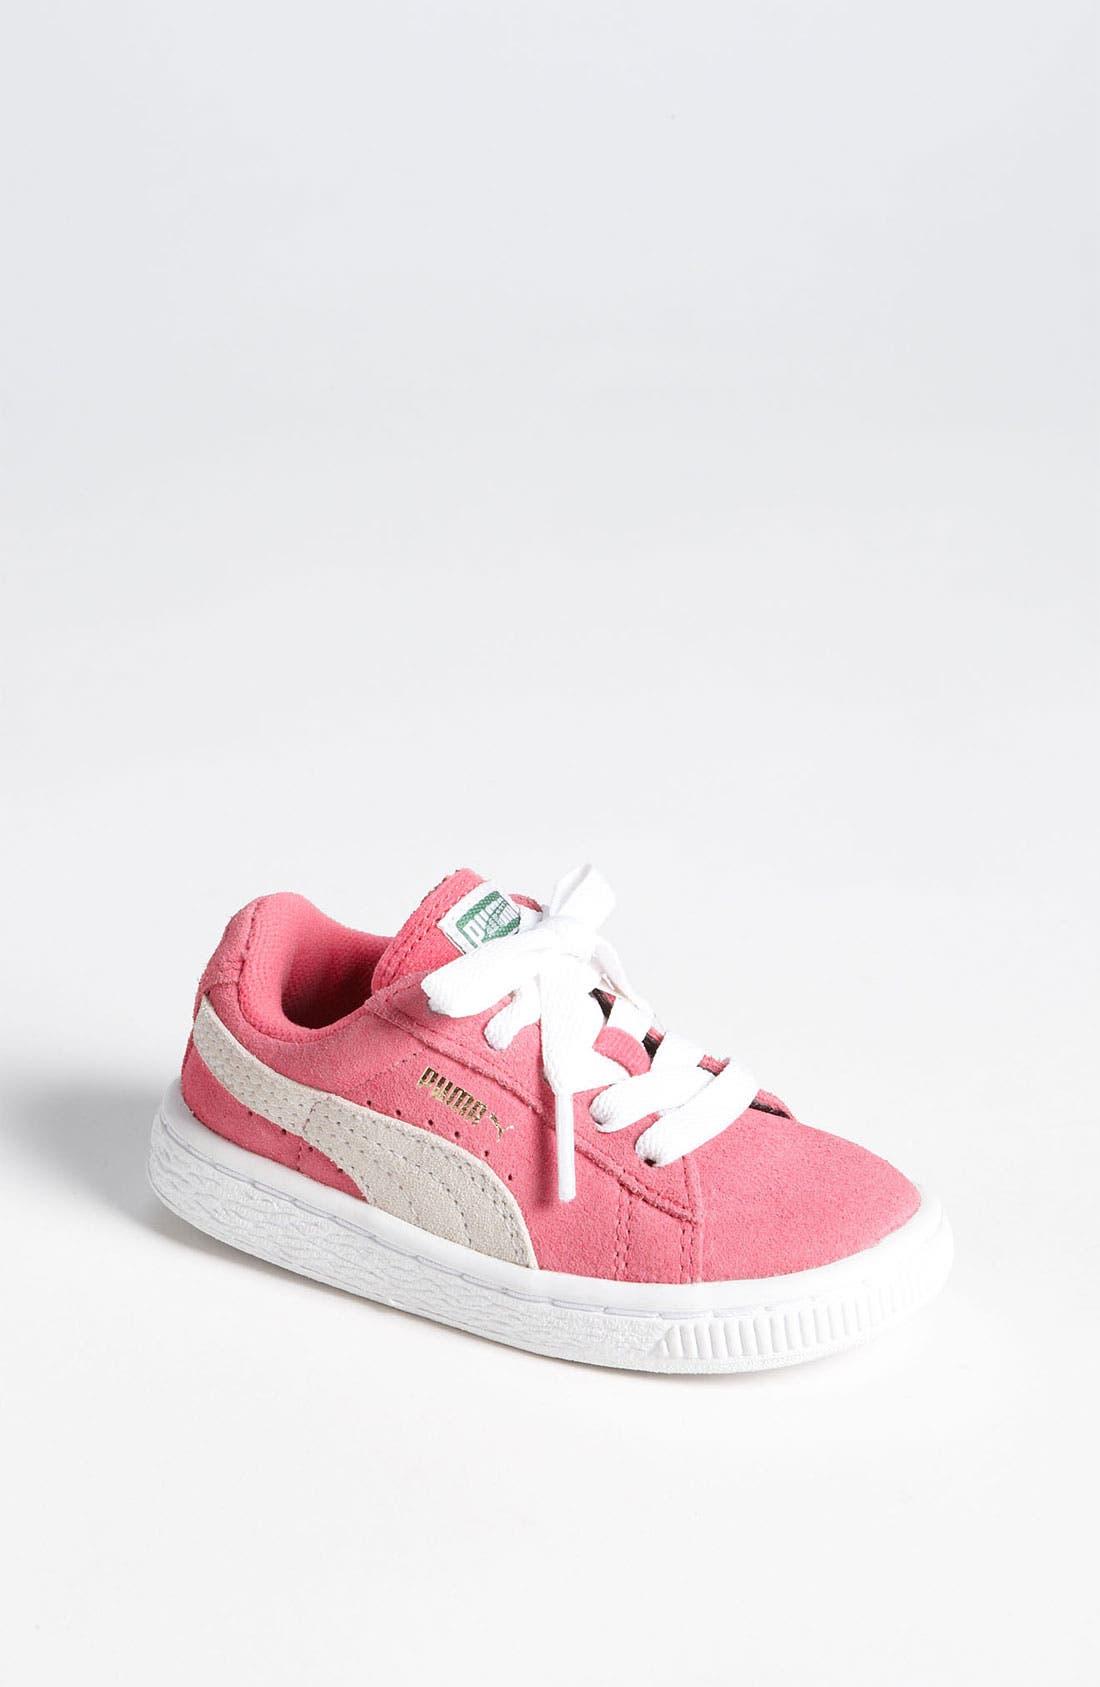 Alternate Image 1 Selected - PUMA 'Suede Classic' Sneaker (Baby, Walker, Toddler, Little Kid & Big Kid)